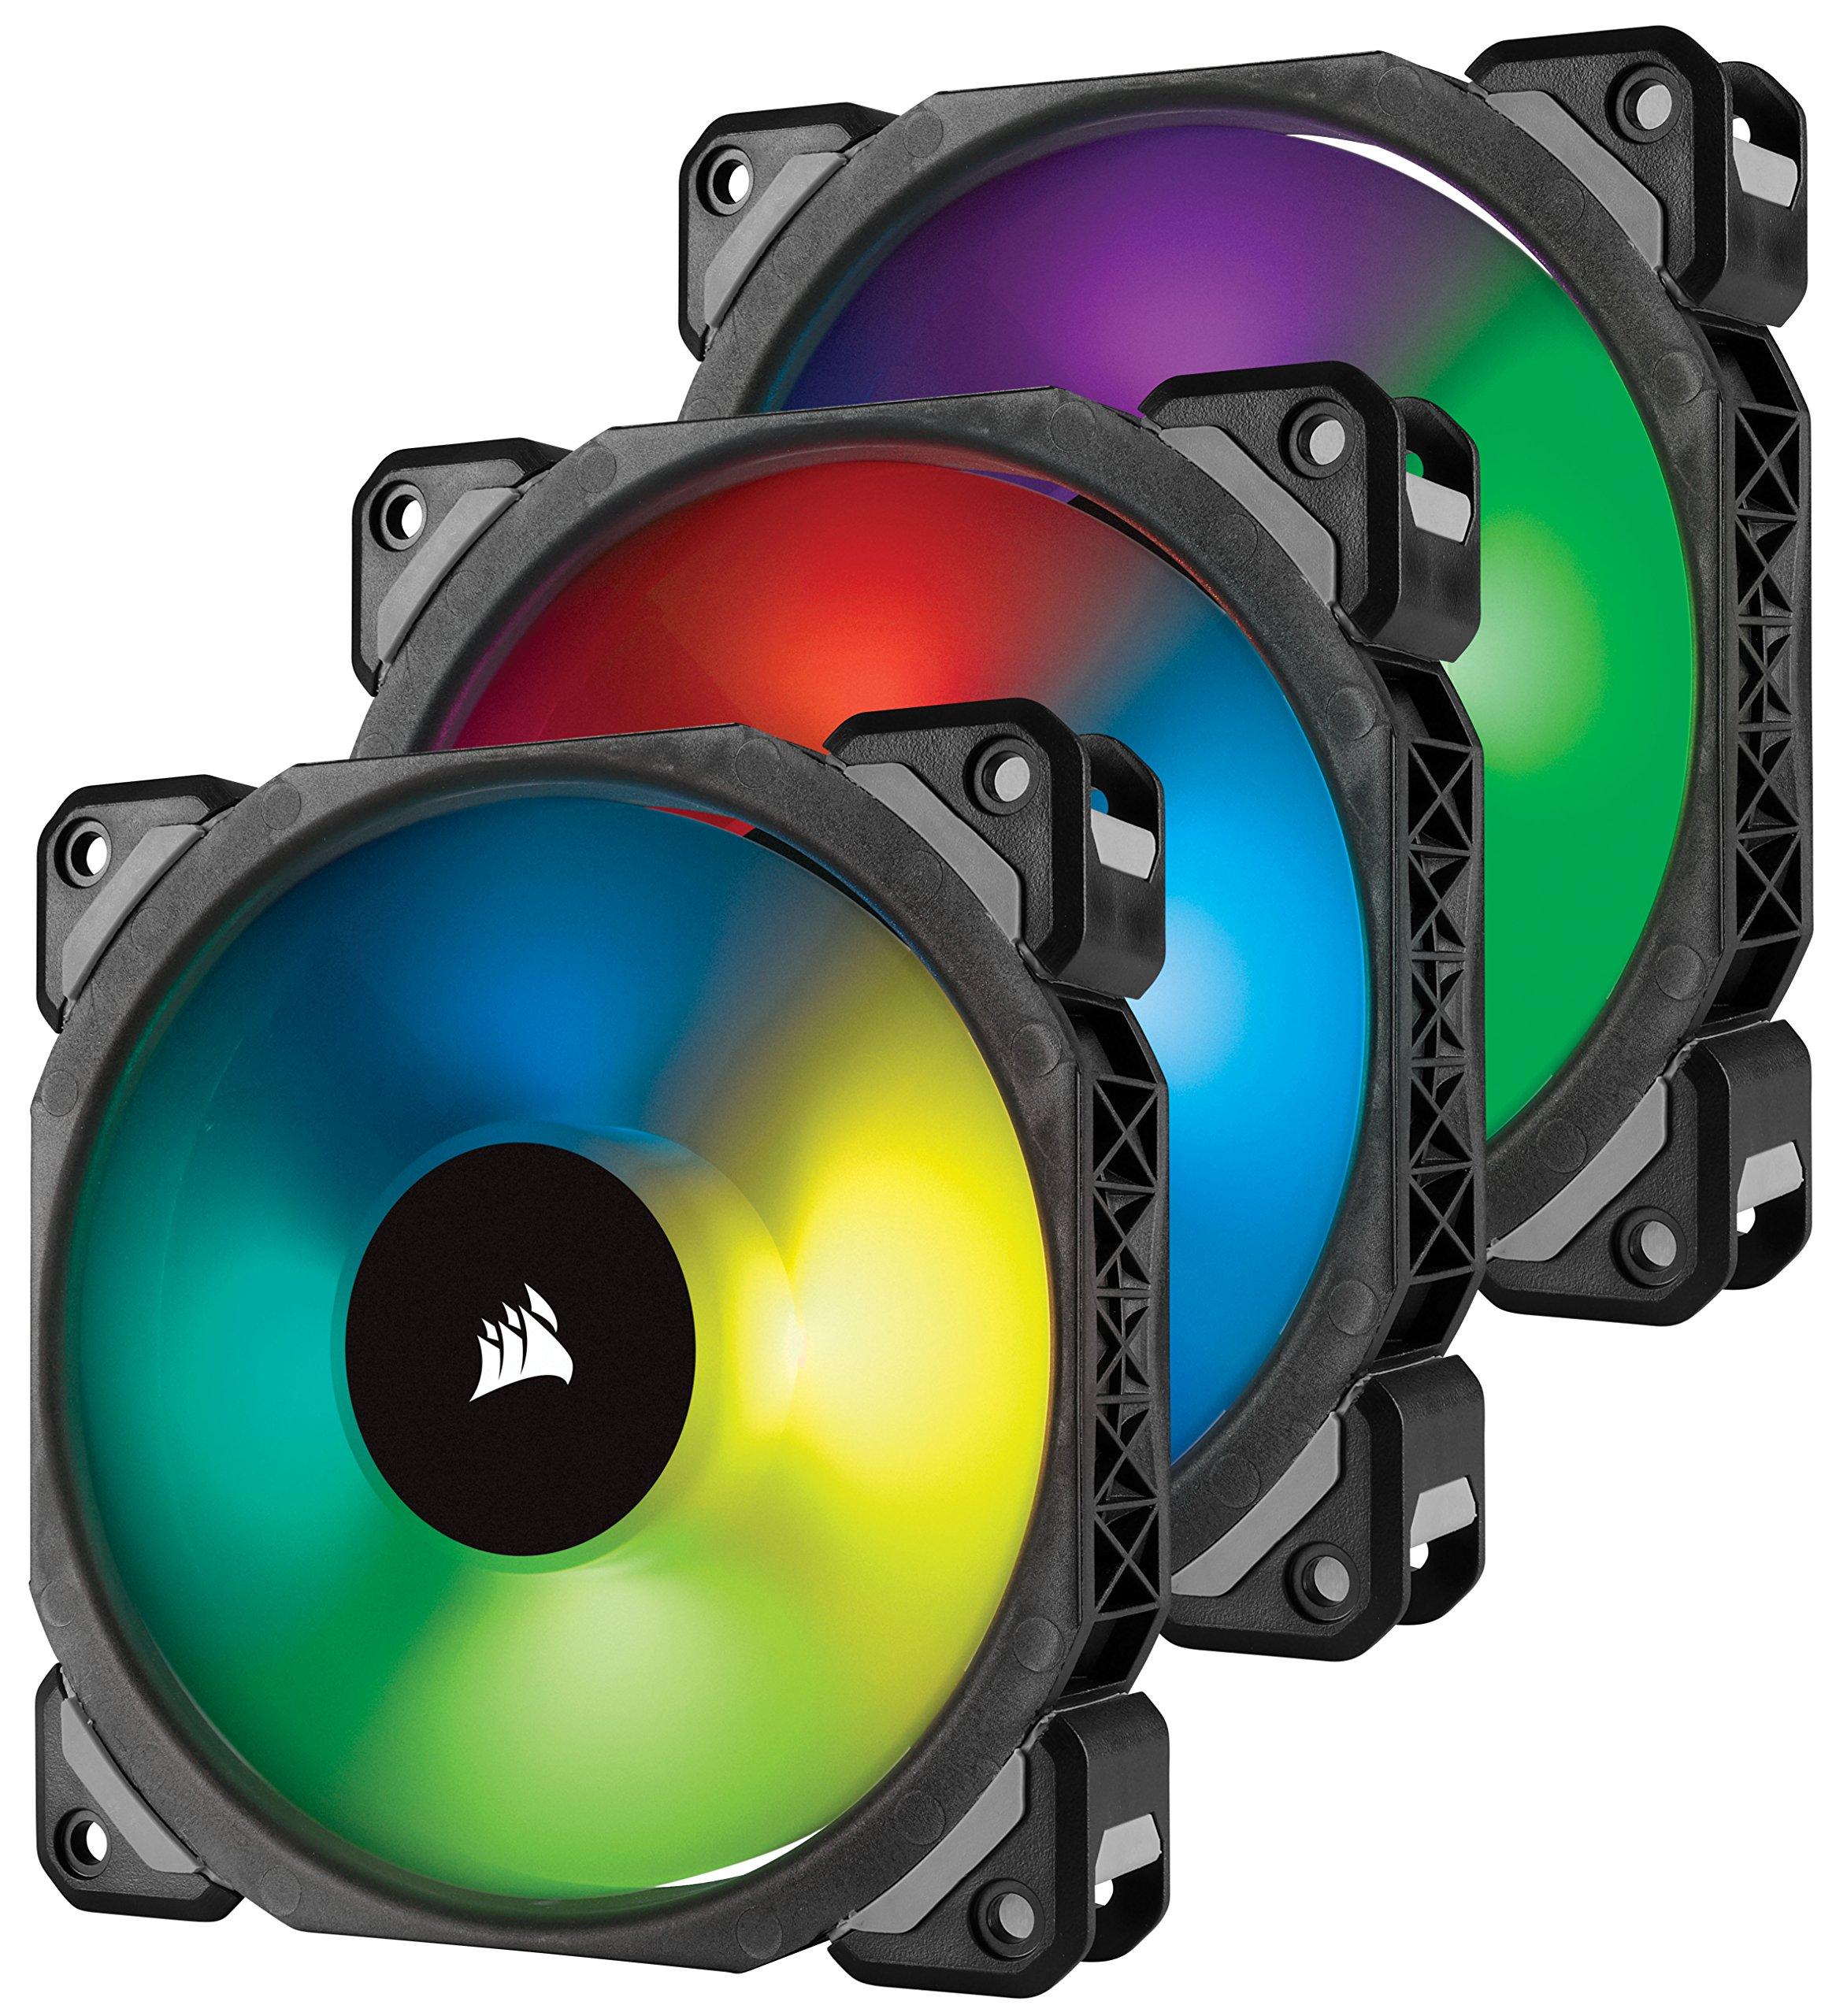 Corsair ML120 PRO 120mm Premium Magnetic Levitation RGB LED PWM Fan with Lighting Node 3 Pack (CO-9050076-WW) by Corsair